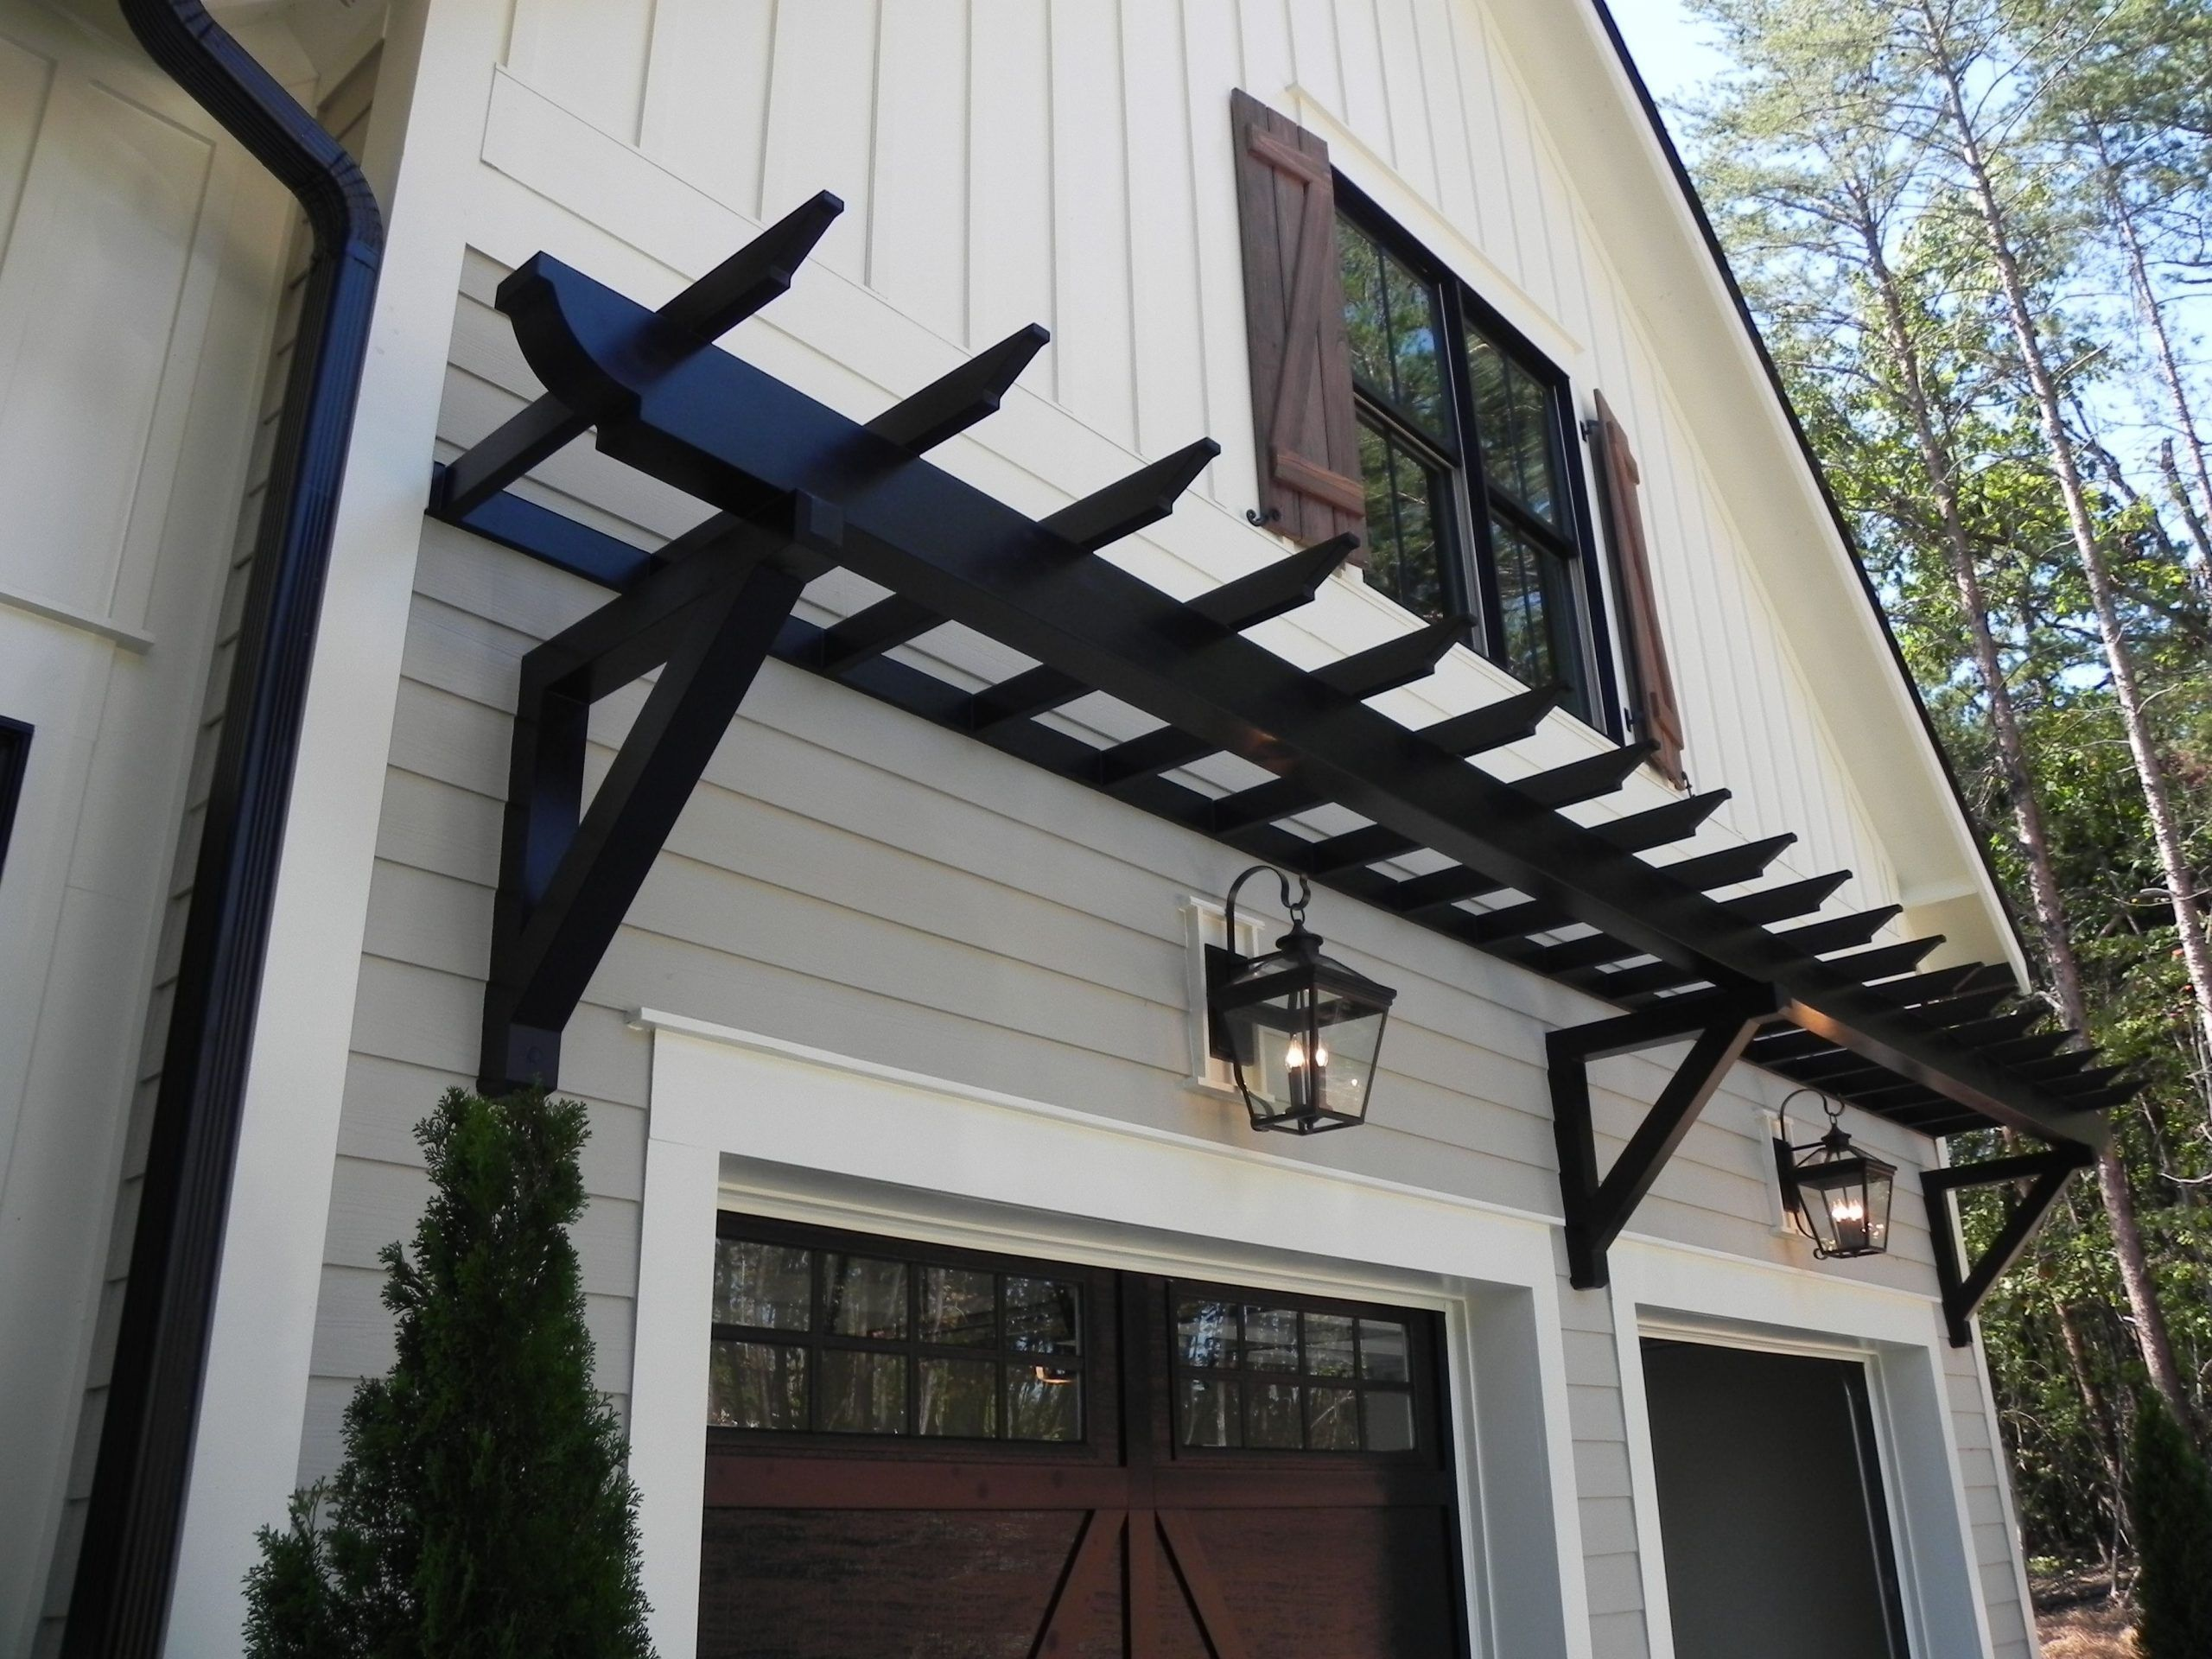 Pvc Trellis Home Ideas Garage Pergola Garage Trellis Pergola